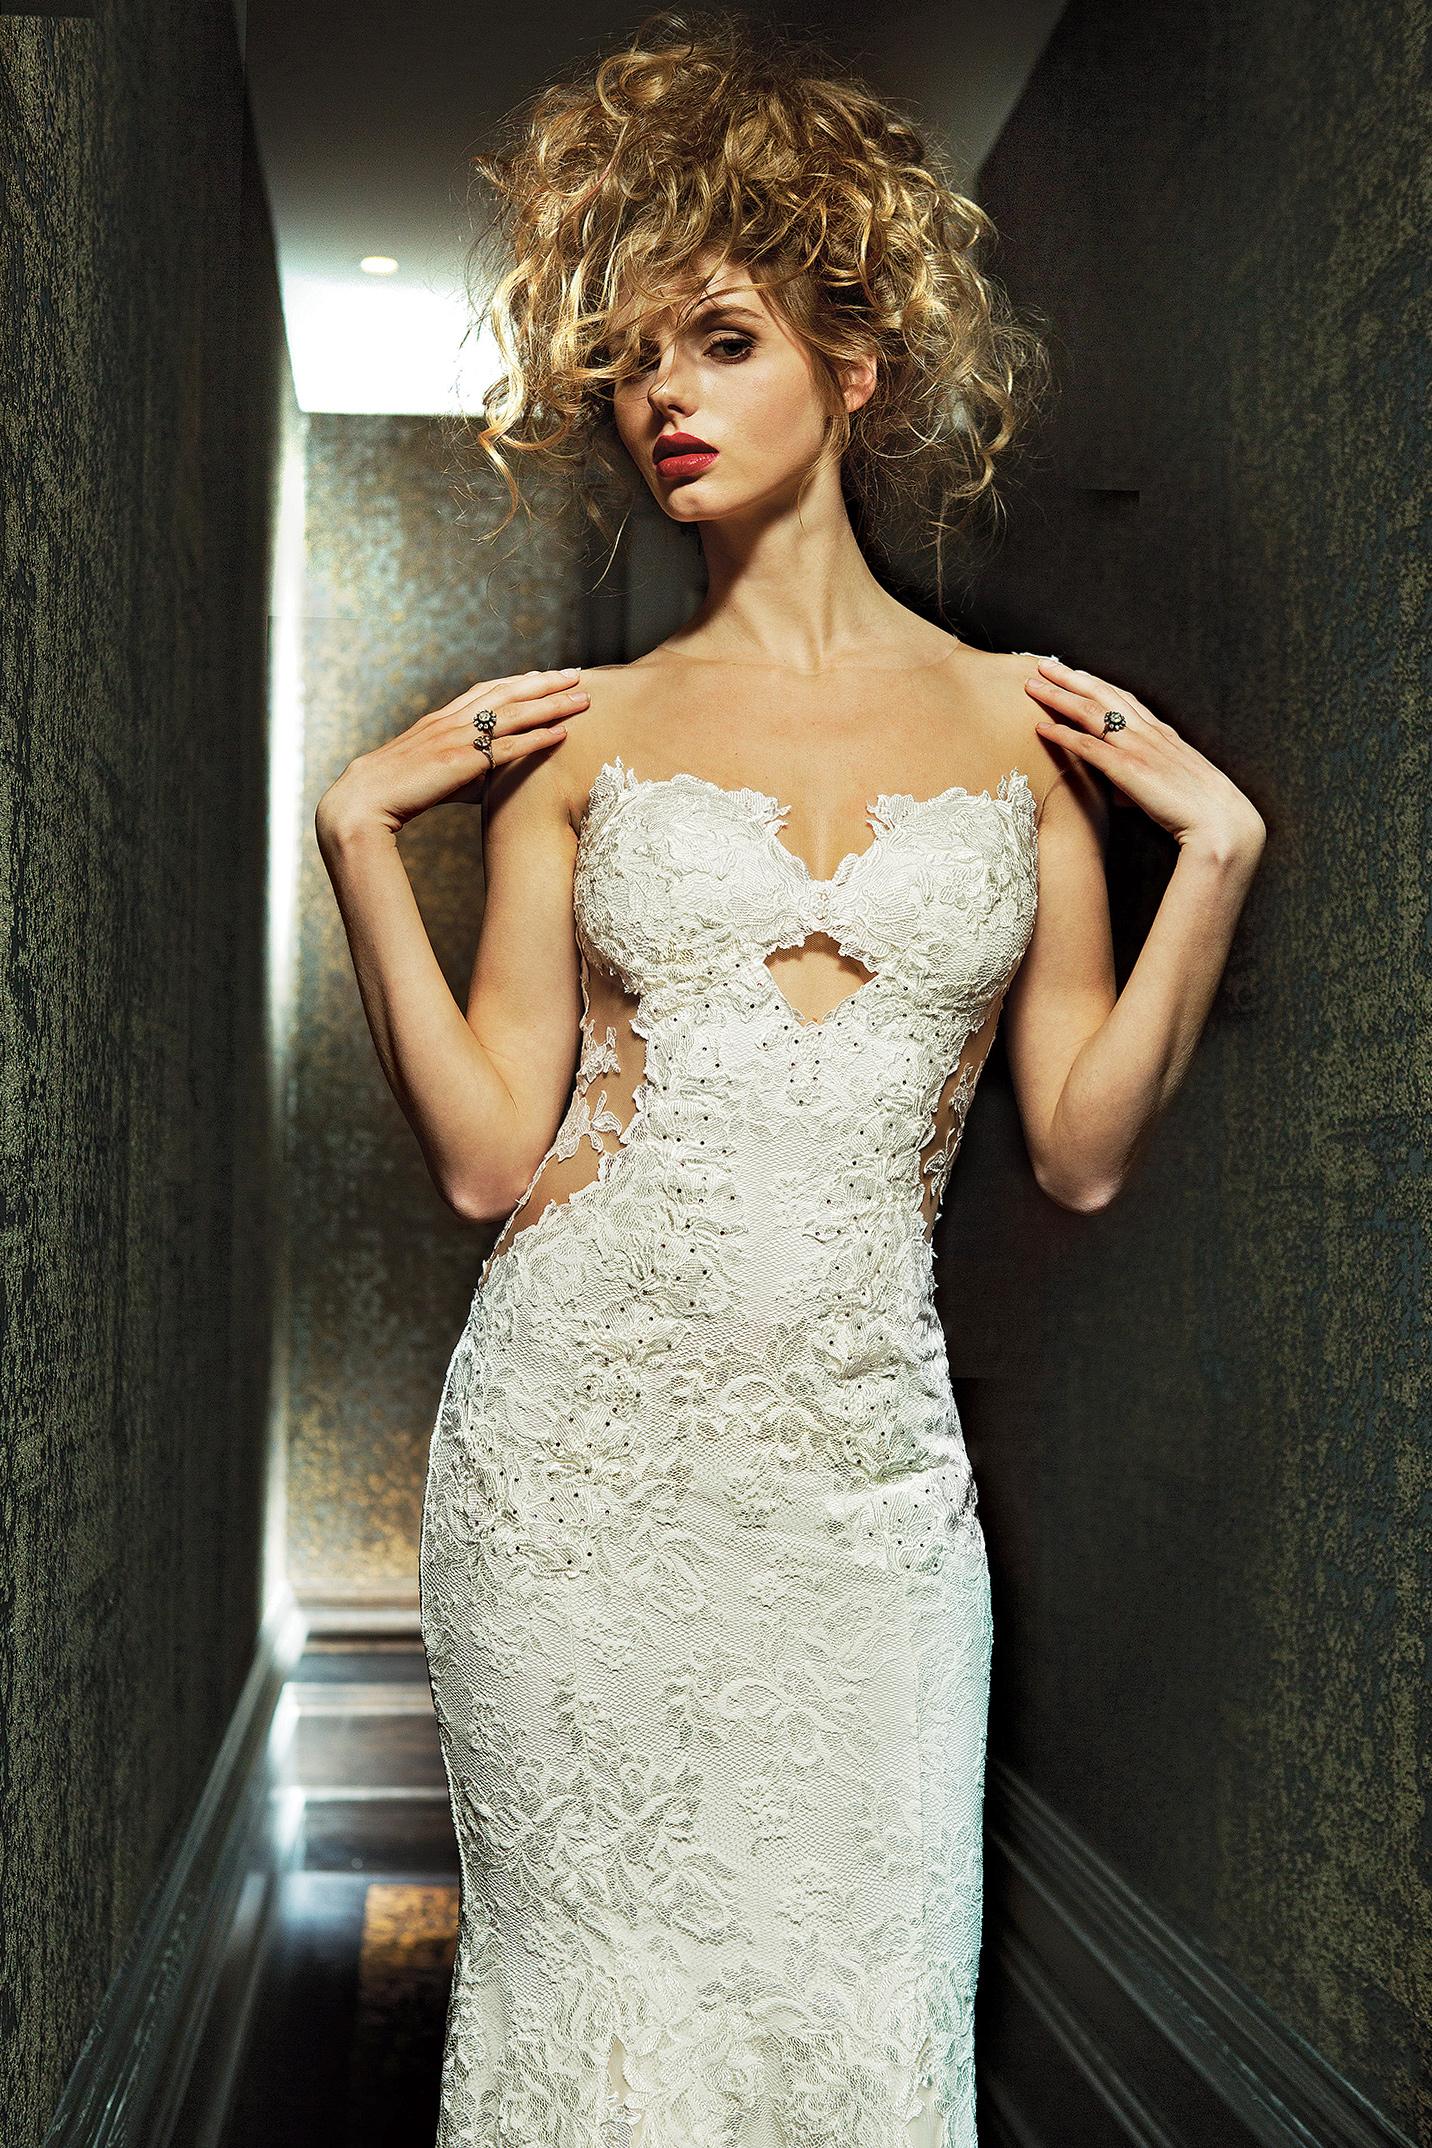 olvi wedding dress spring 2019 peekaboo bodice sheer side panels